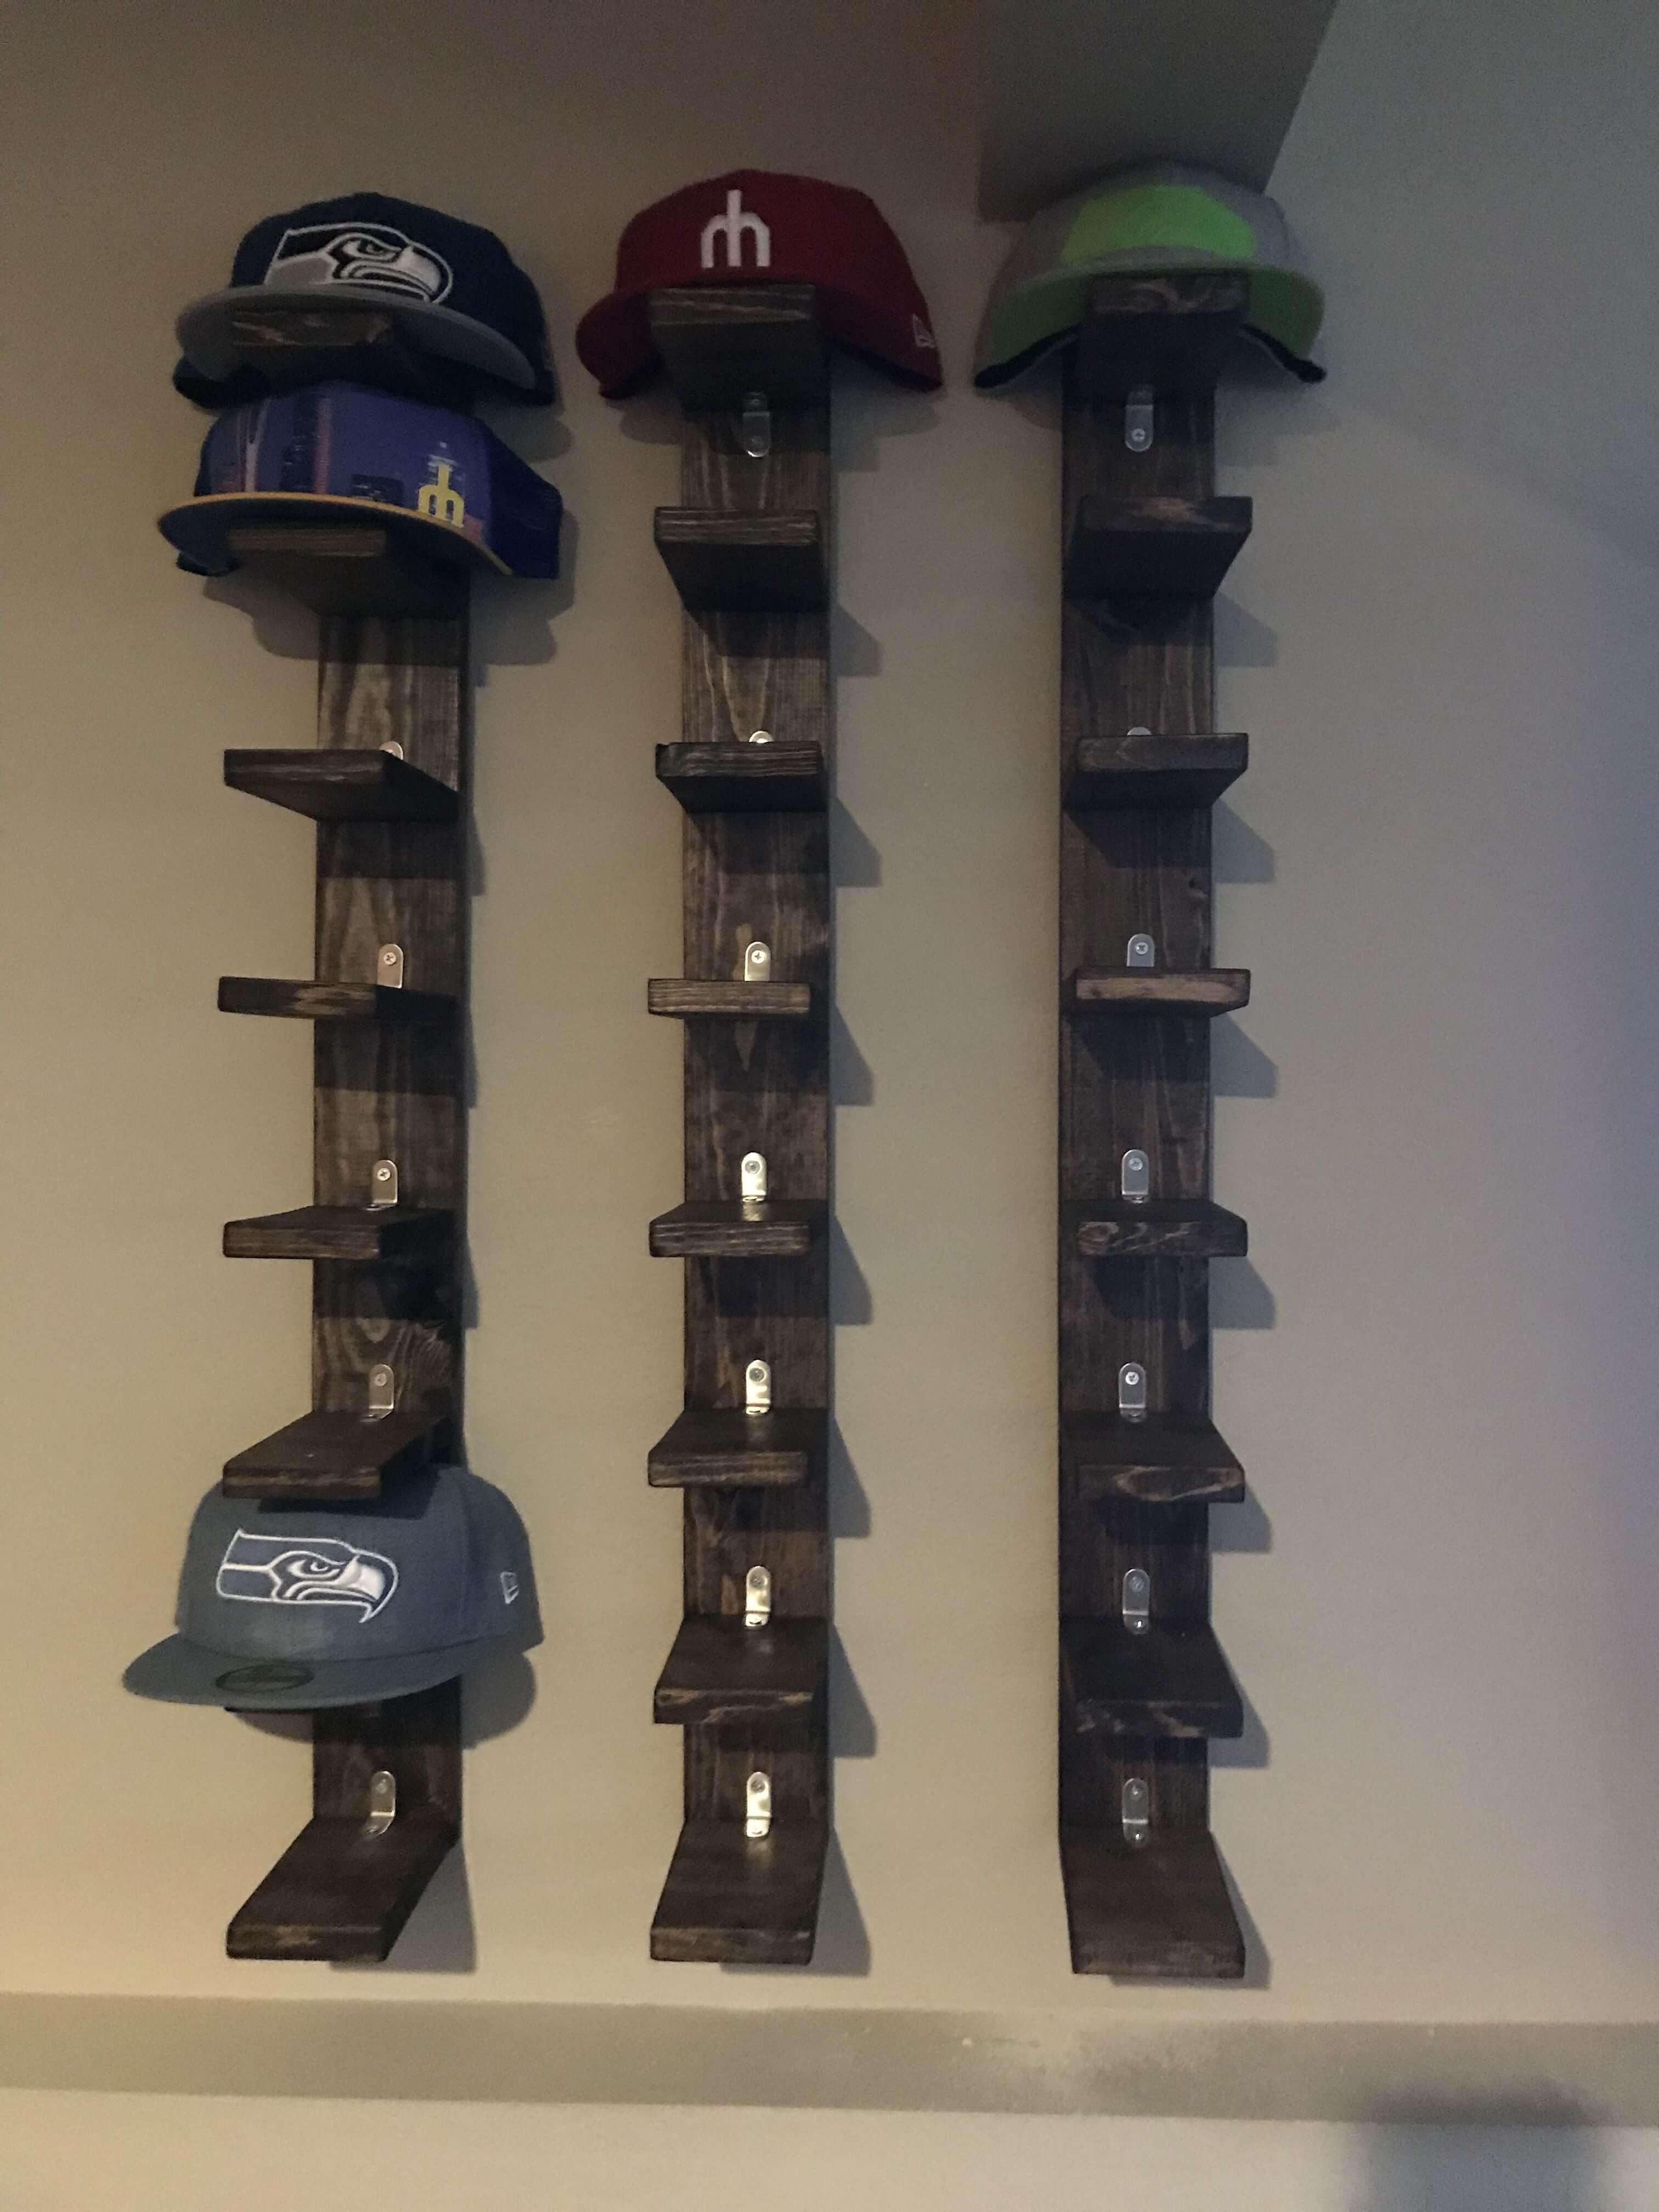 11 Creative Diy Hat Rack Ideas For Your Next Project Home Junkee Diy Hat Rack Diy Hat Storage Wall Hat Racks